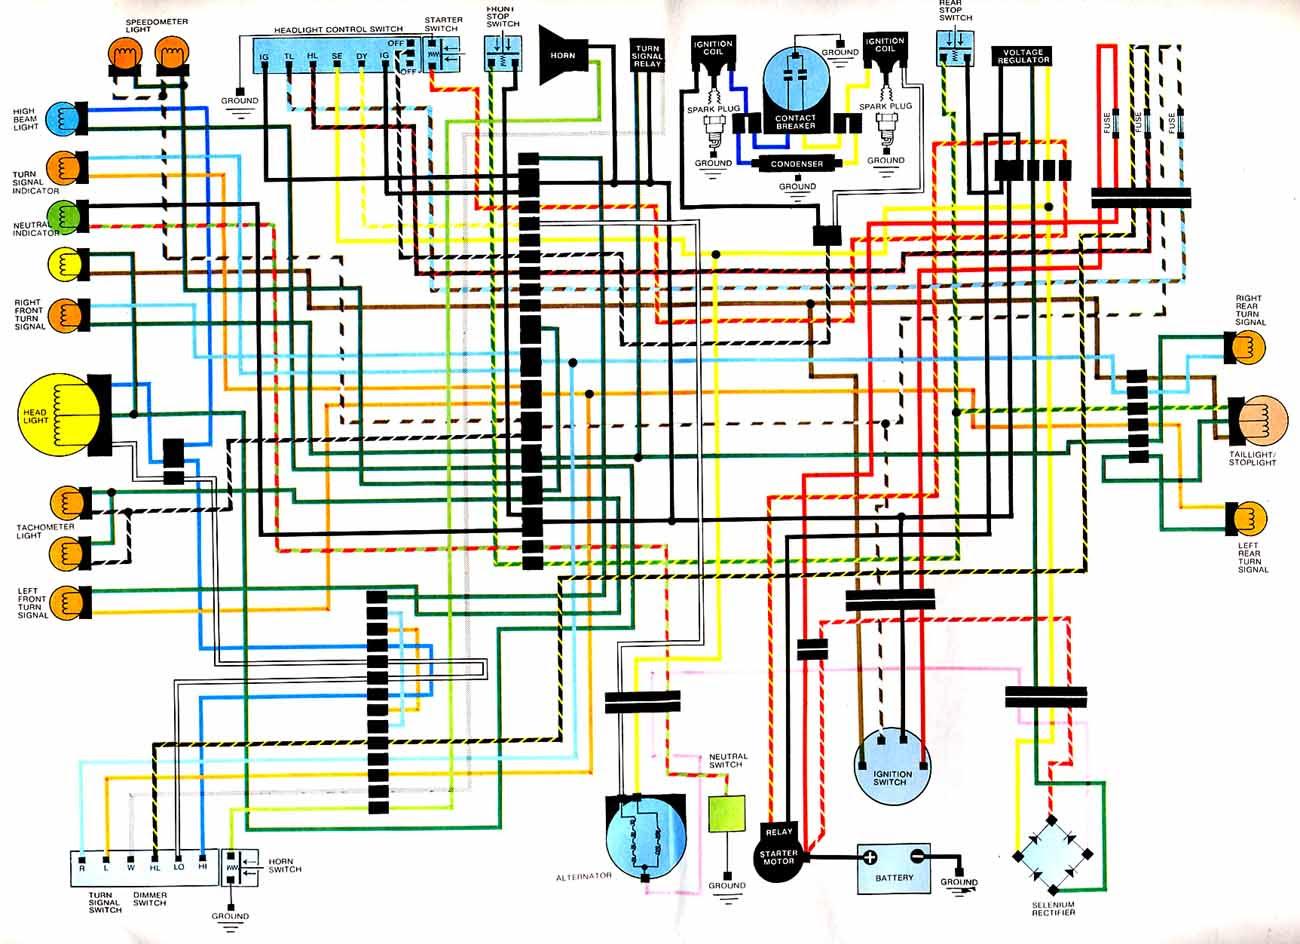 Diagram Xbox 360 Wiring Diagram Full Version Hd Quality Wiring Diagram Schematictv2h Romaindanza It